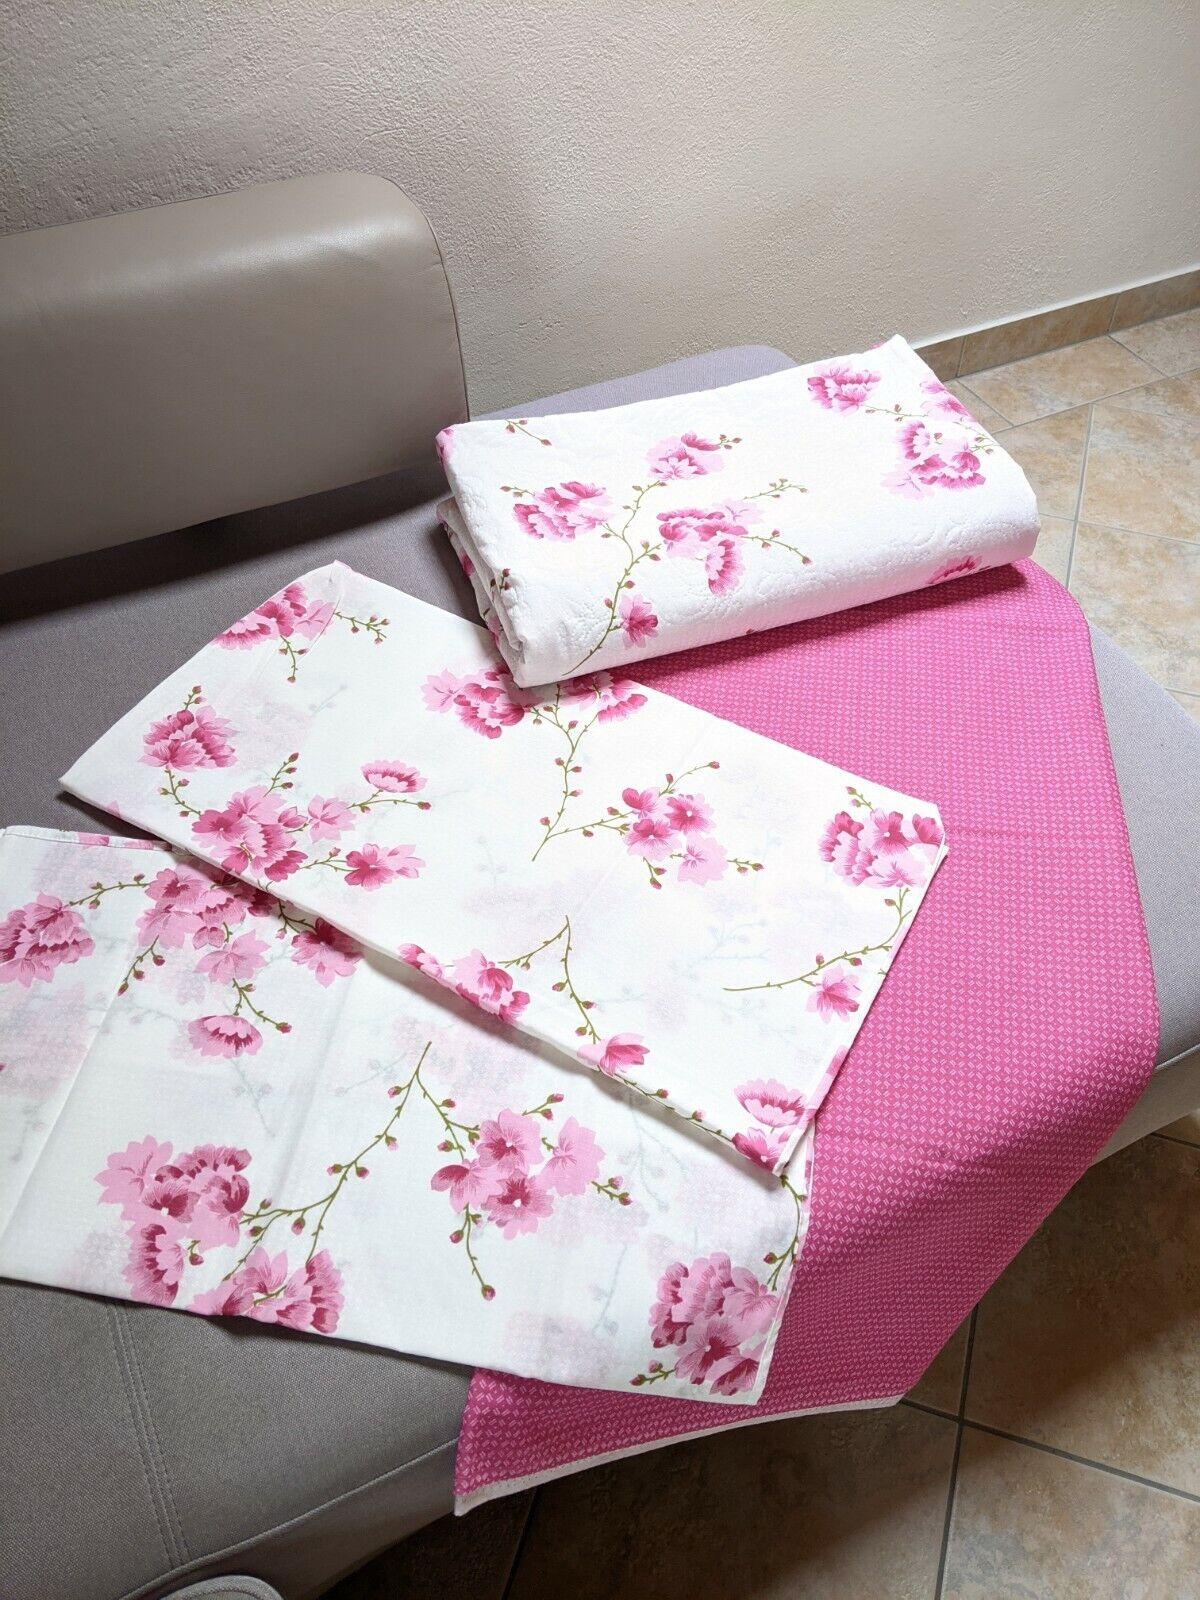 Bettdecke Bettlaken Kissenbezug Rosa Weiß geblümt Neu! Bettwäsche Bettüberwurf